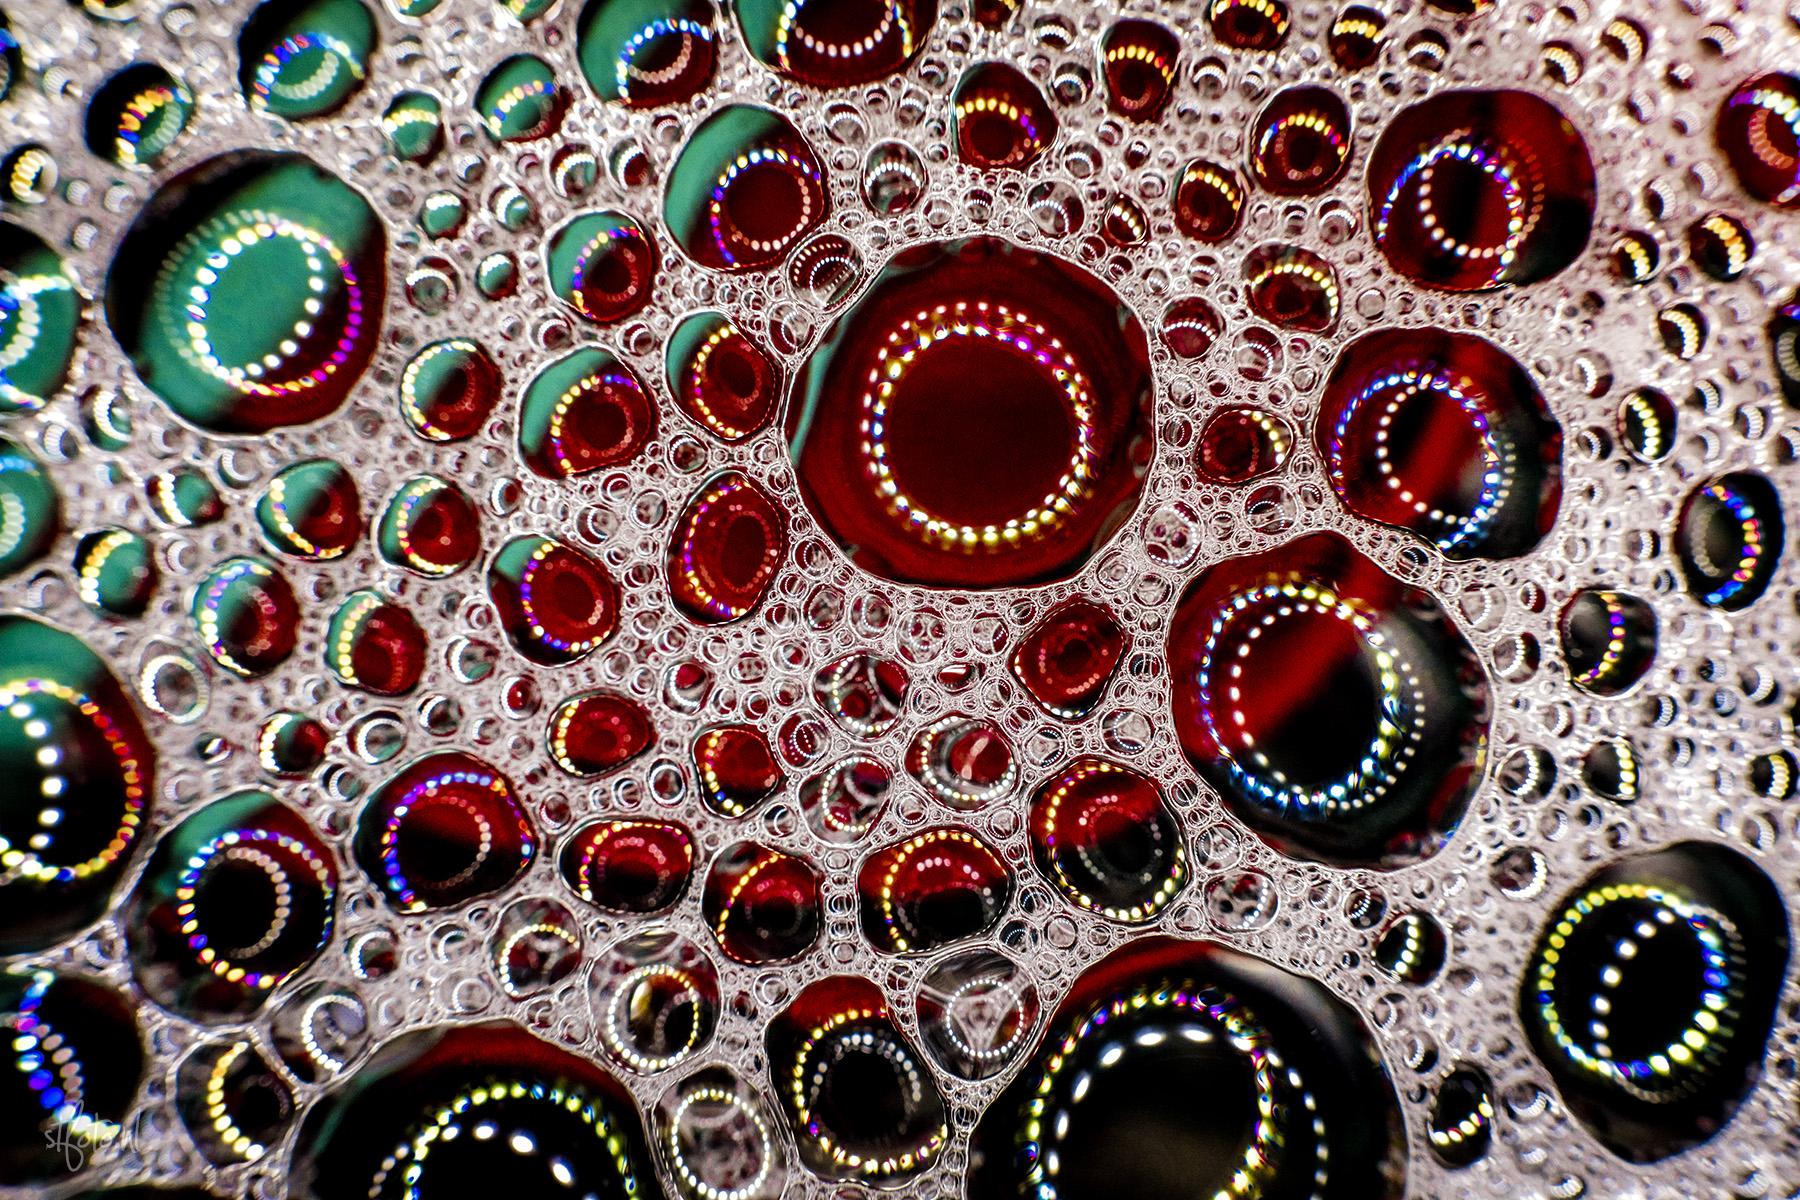 Macro photography soap bubbles Canon eos 5DSr